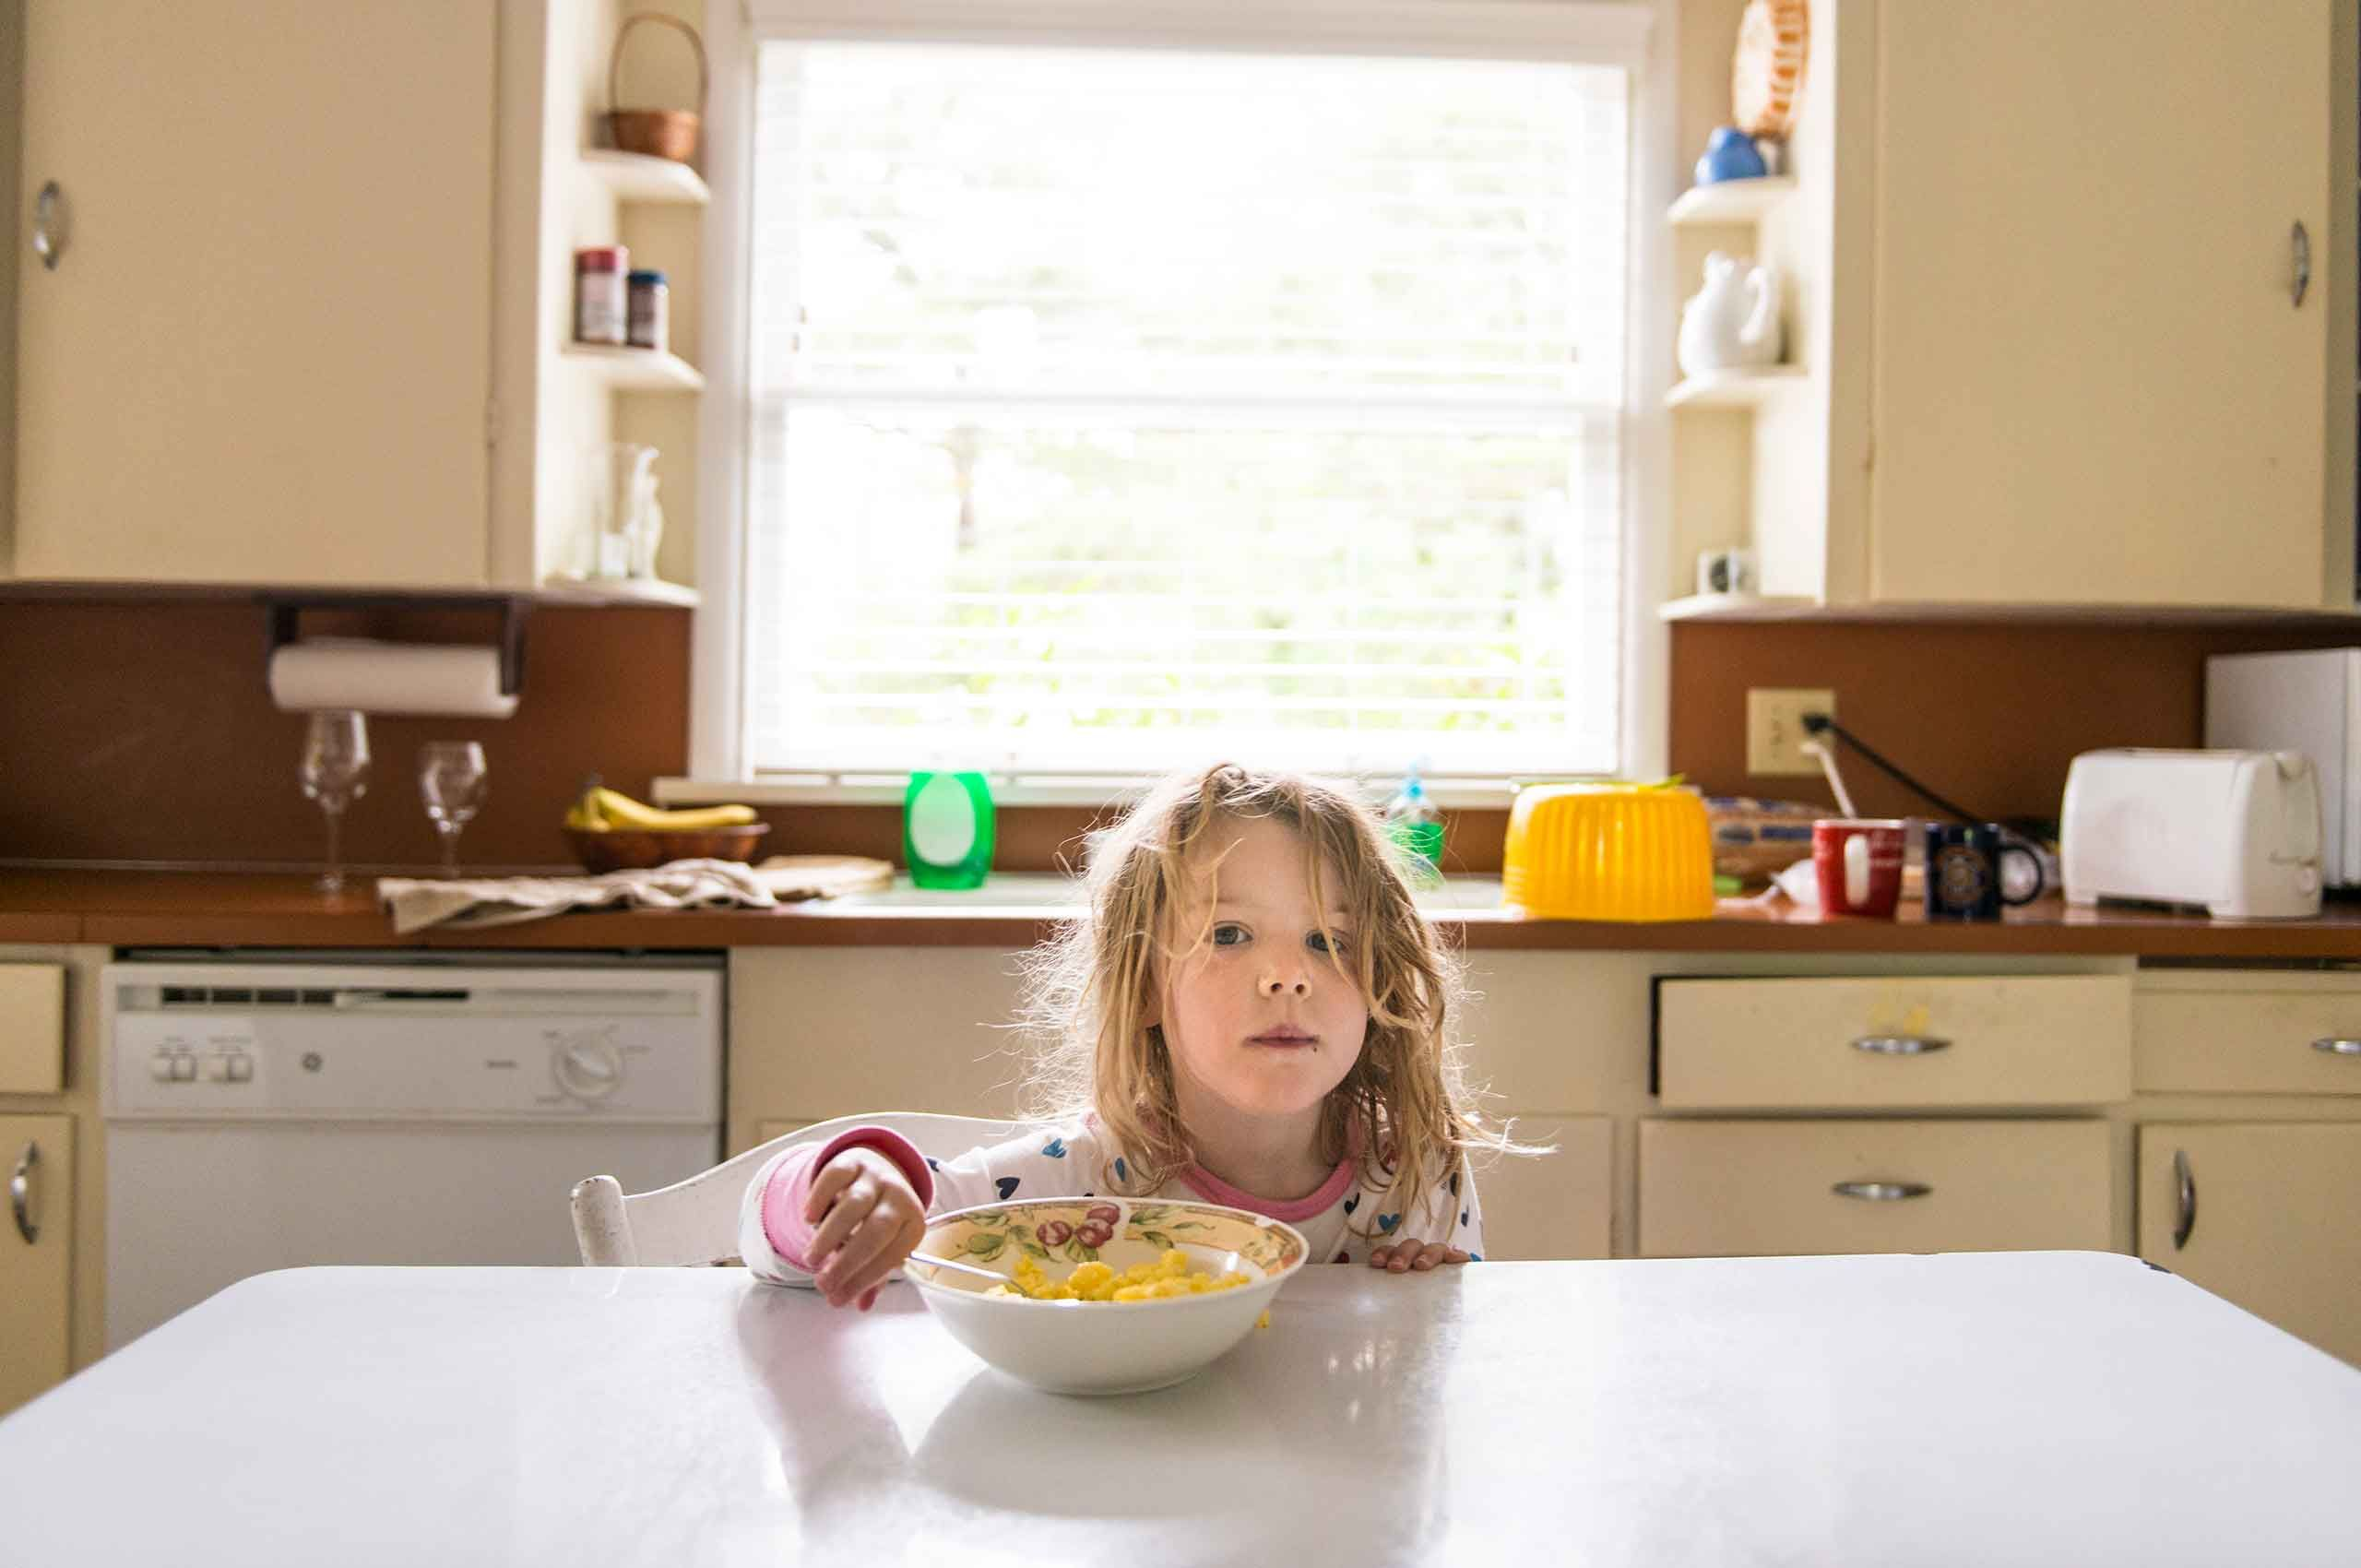 girl-at-table-having-breakfast-portland-by-HenrikOlundPhotography.jpg